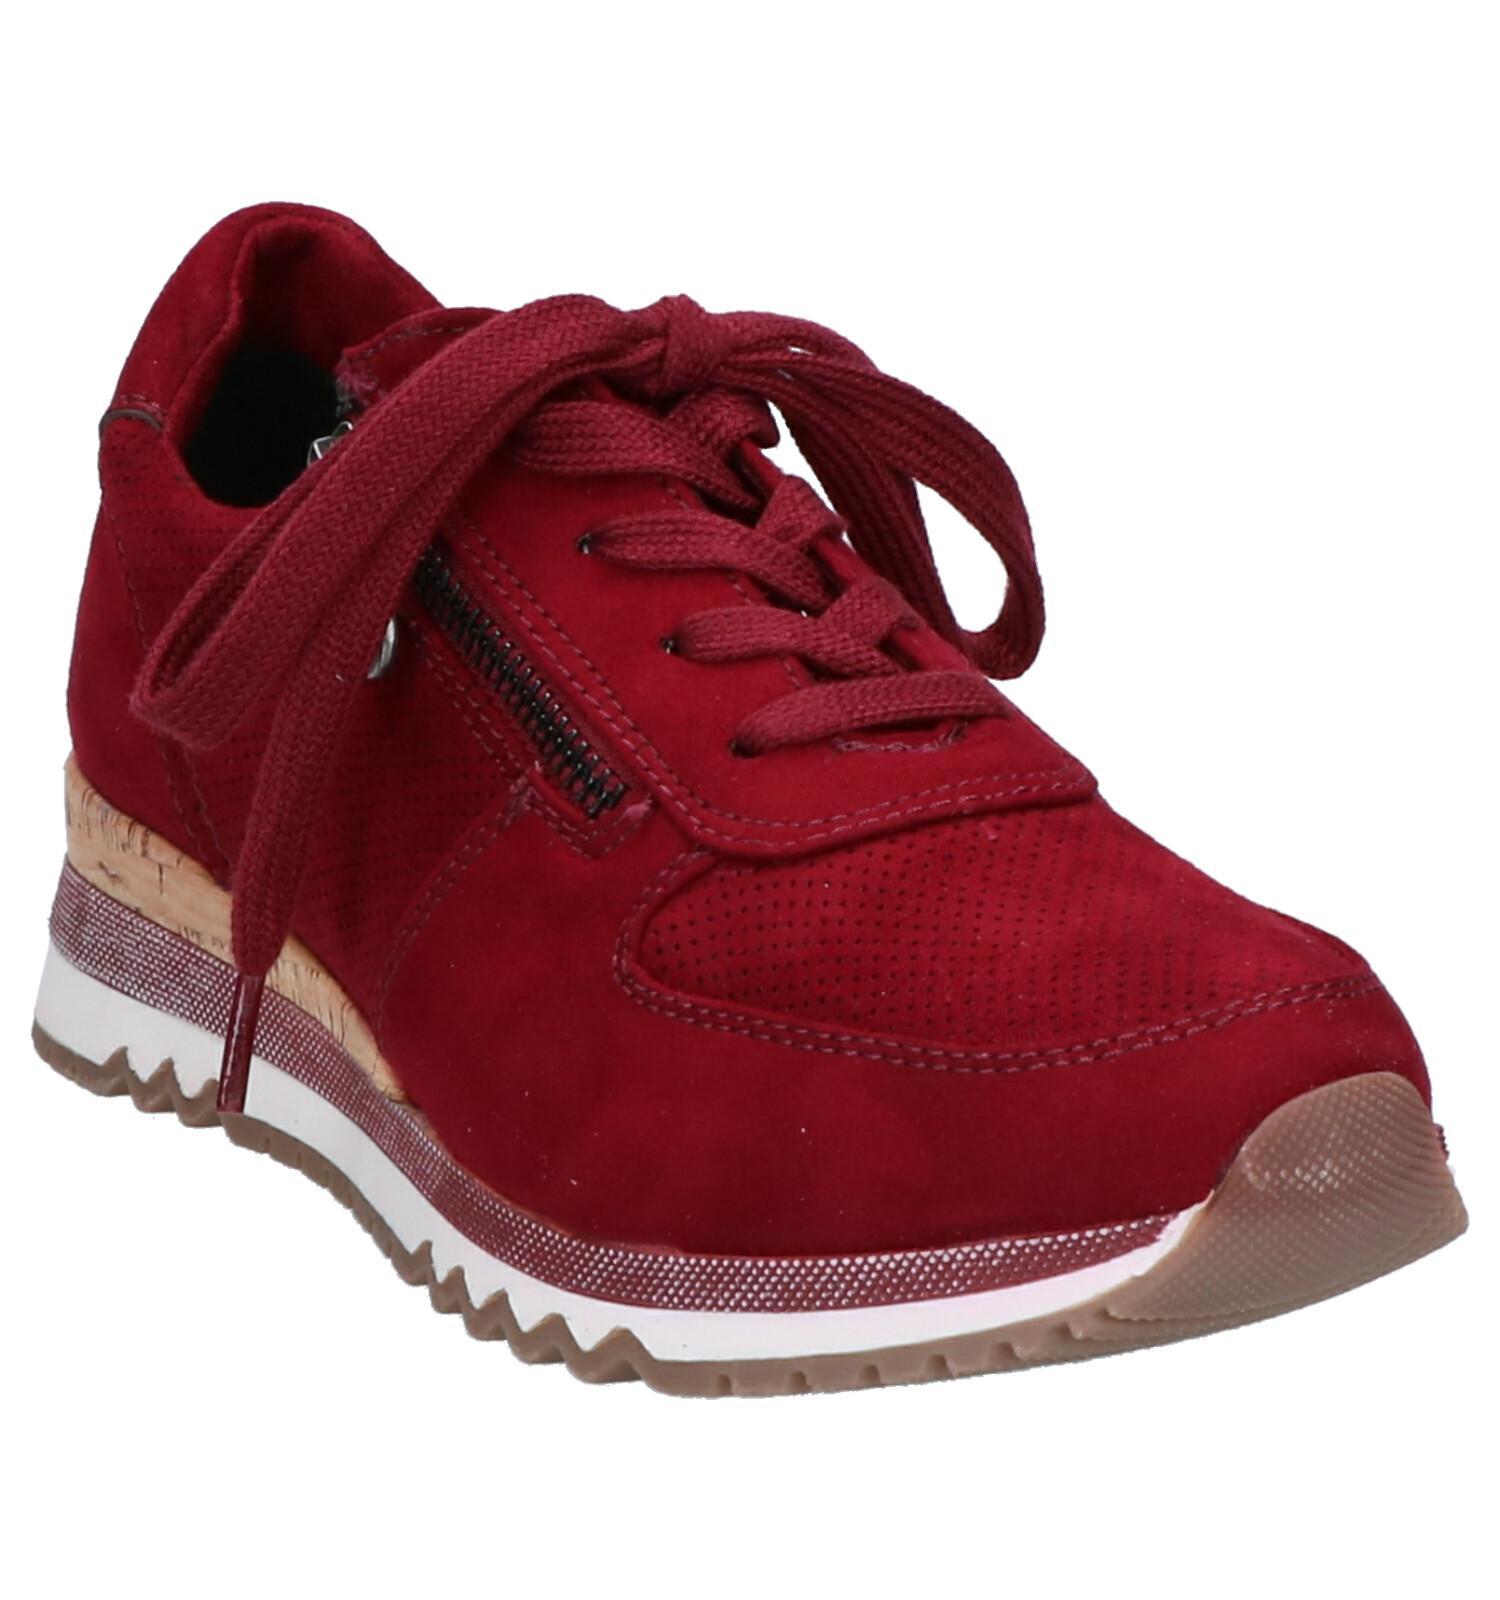 Marco Tozzi Bordeaux Sneakers | TORFS.BE | Gratis verzend en